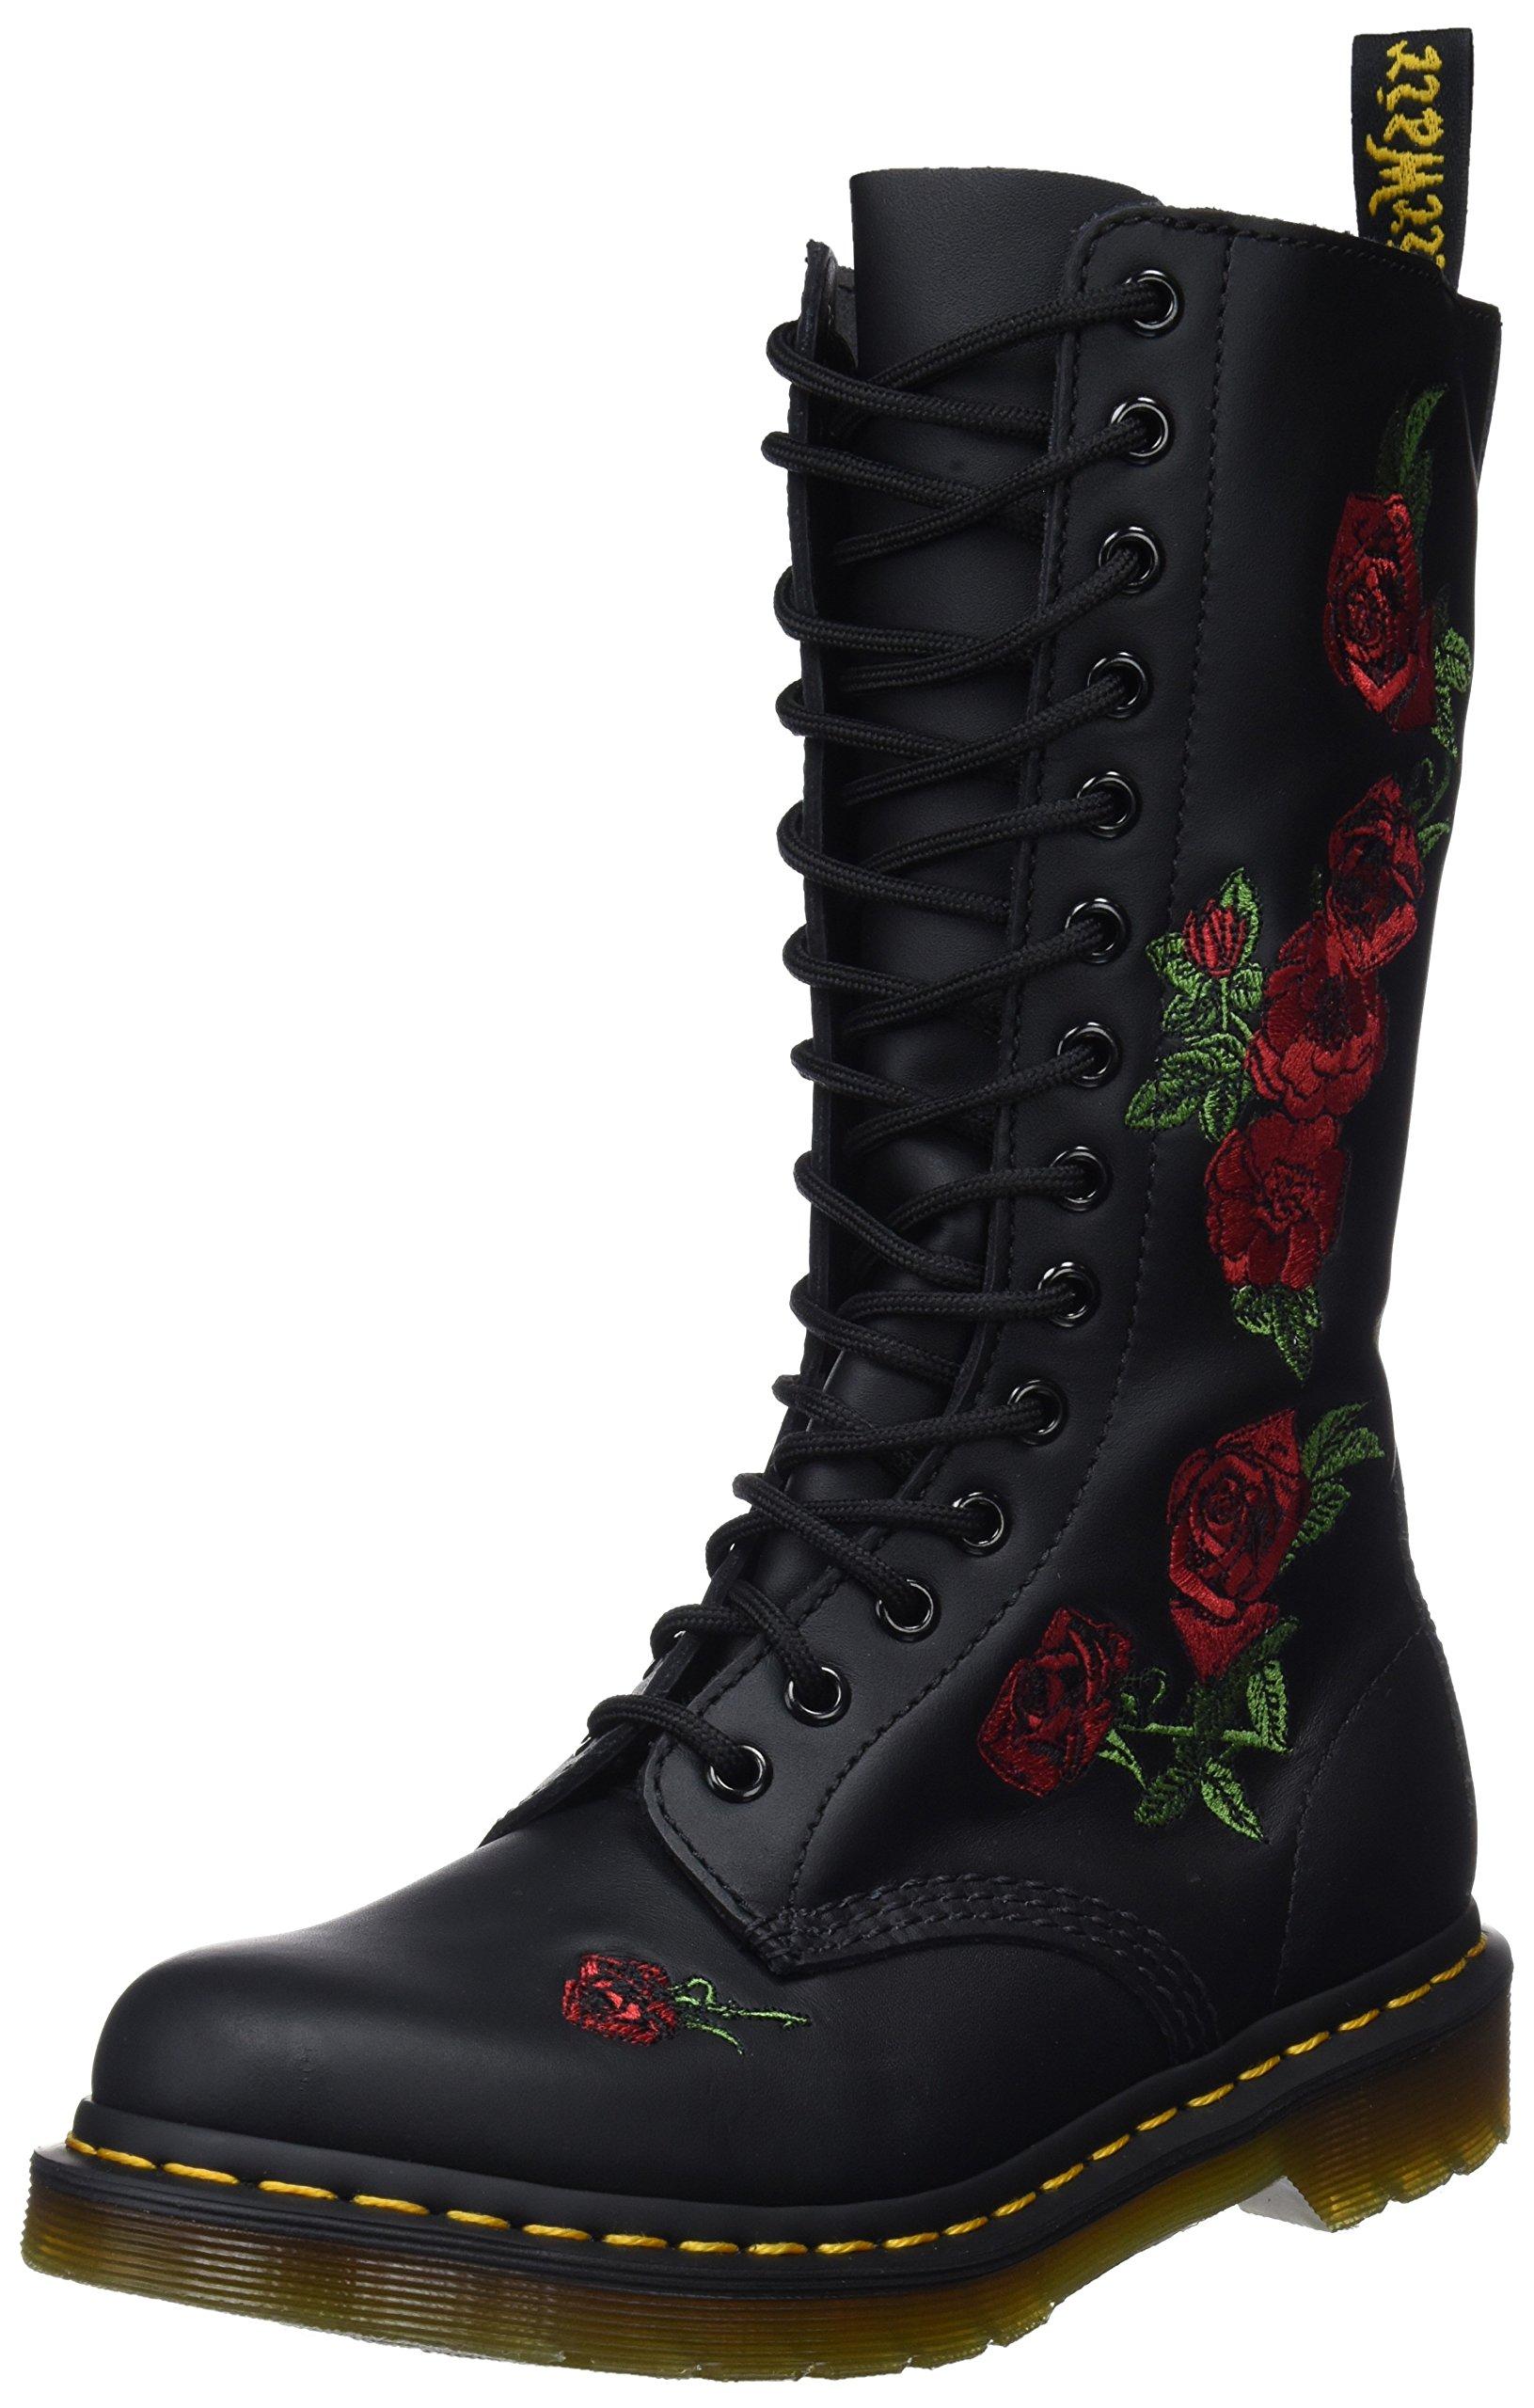 Dr. Martens Women's 1460 8-Eye Casual Boot Black 4 M UK